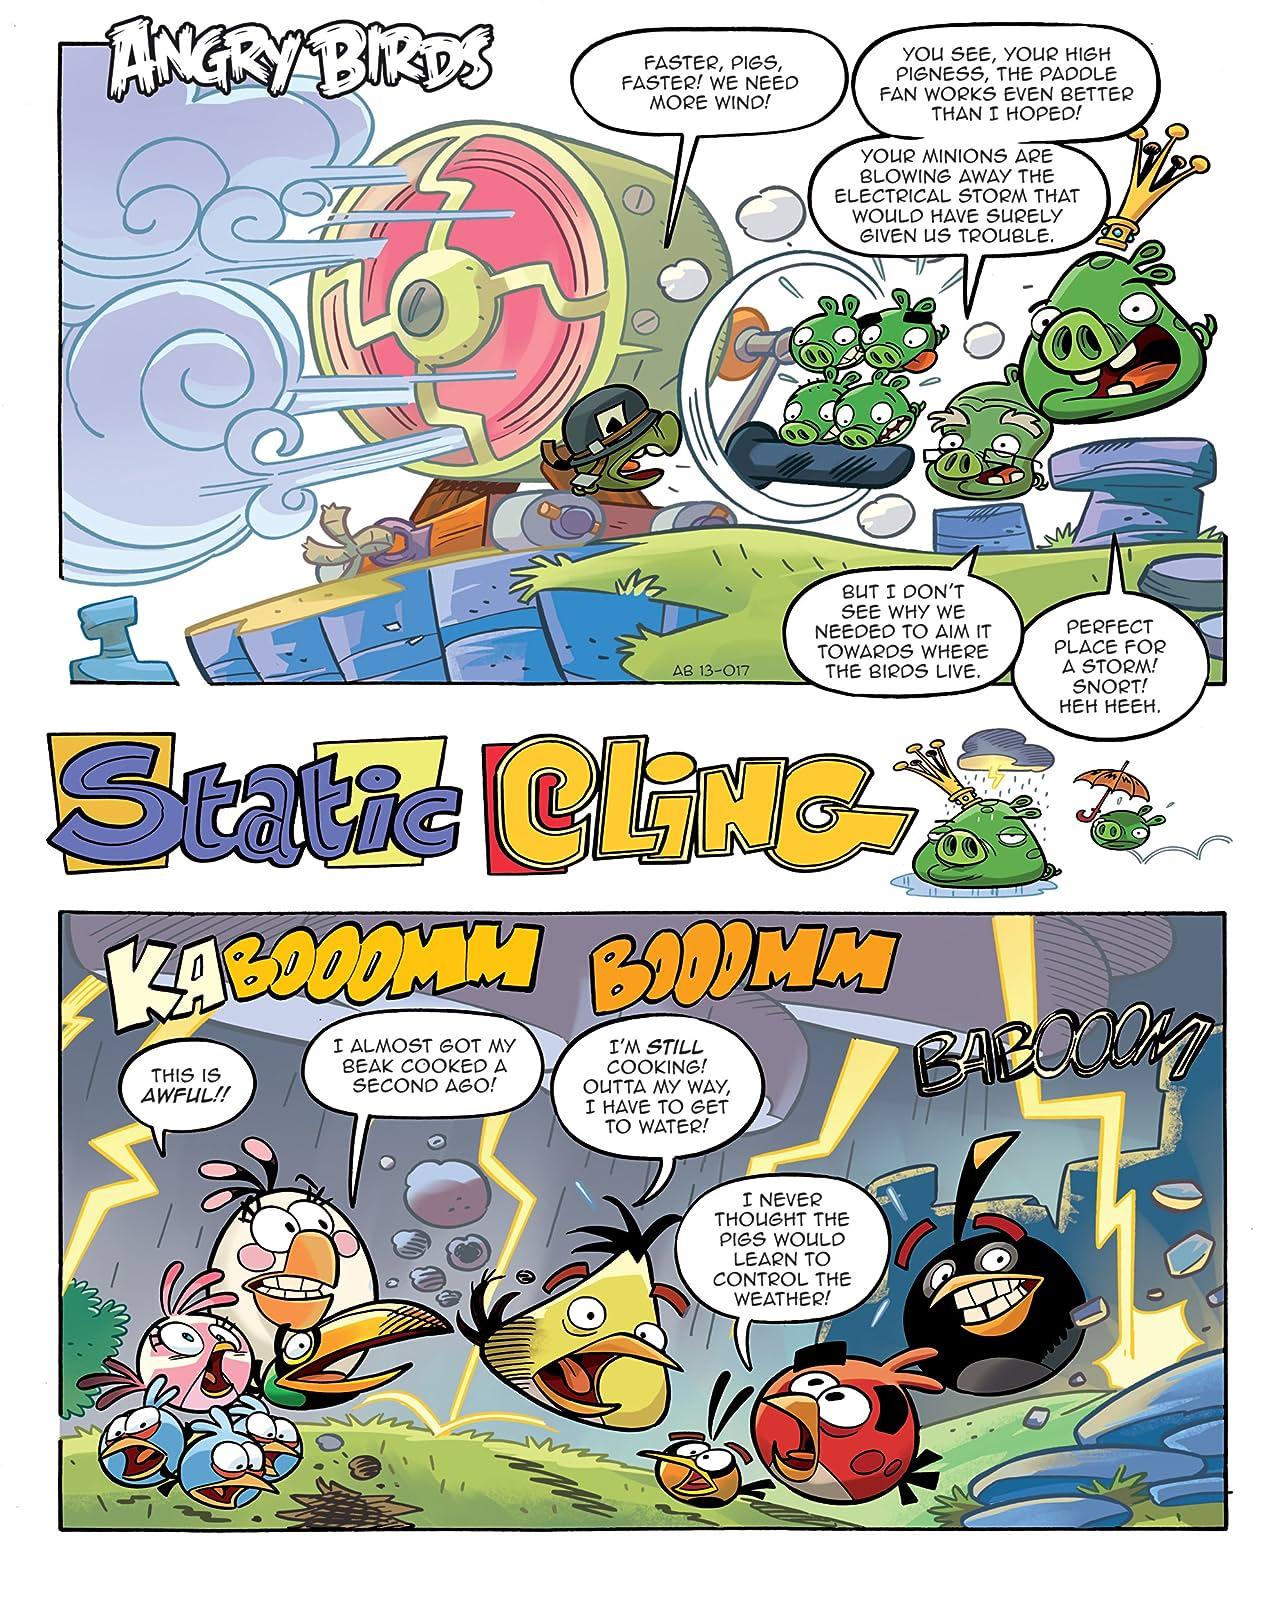 Angry Birds #3: Mini-Comic #6